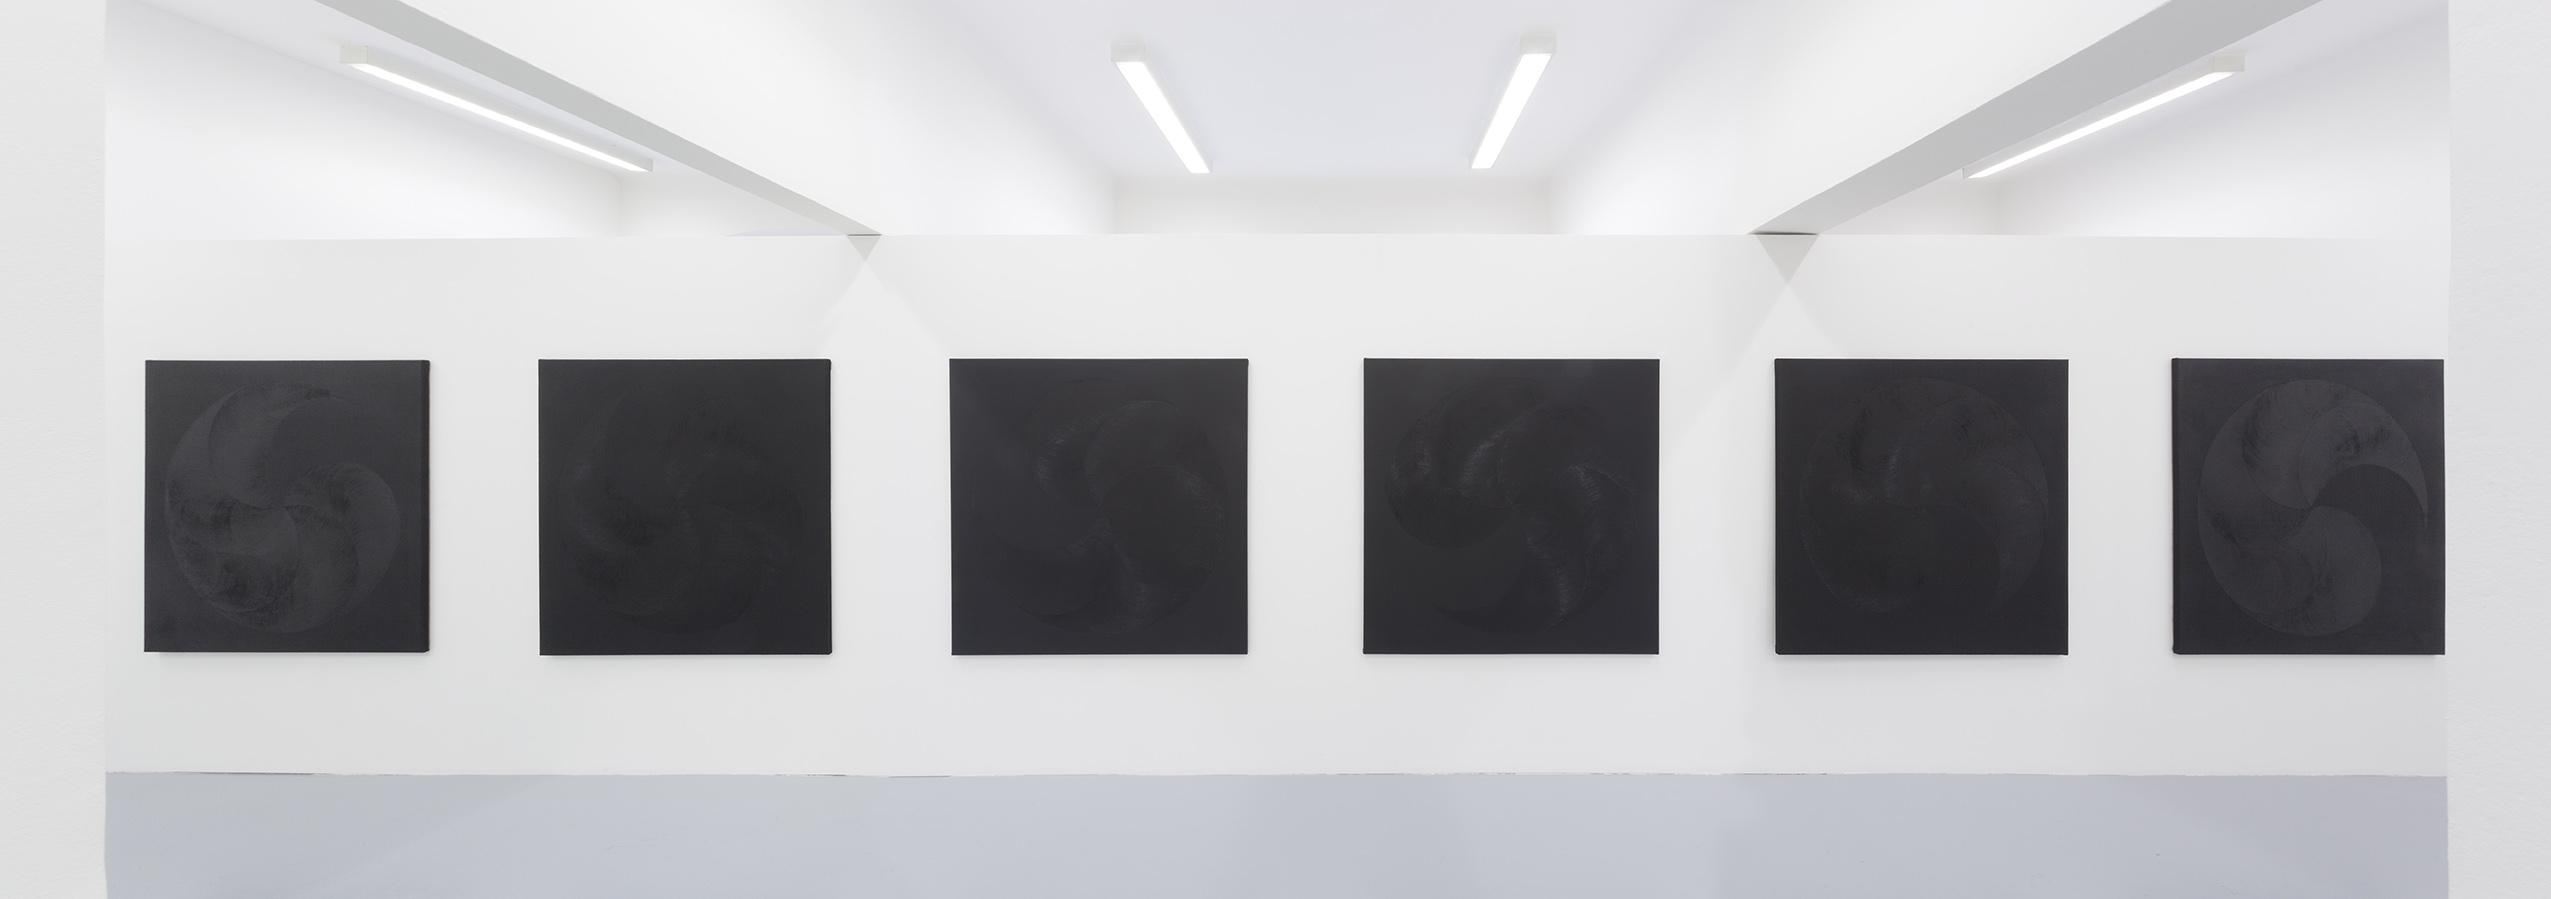 oil on canvas / 6x / 130x130cm